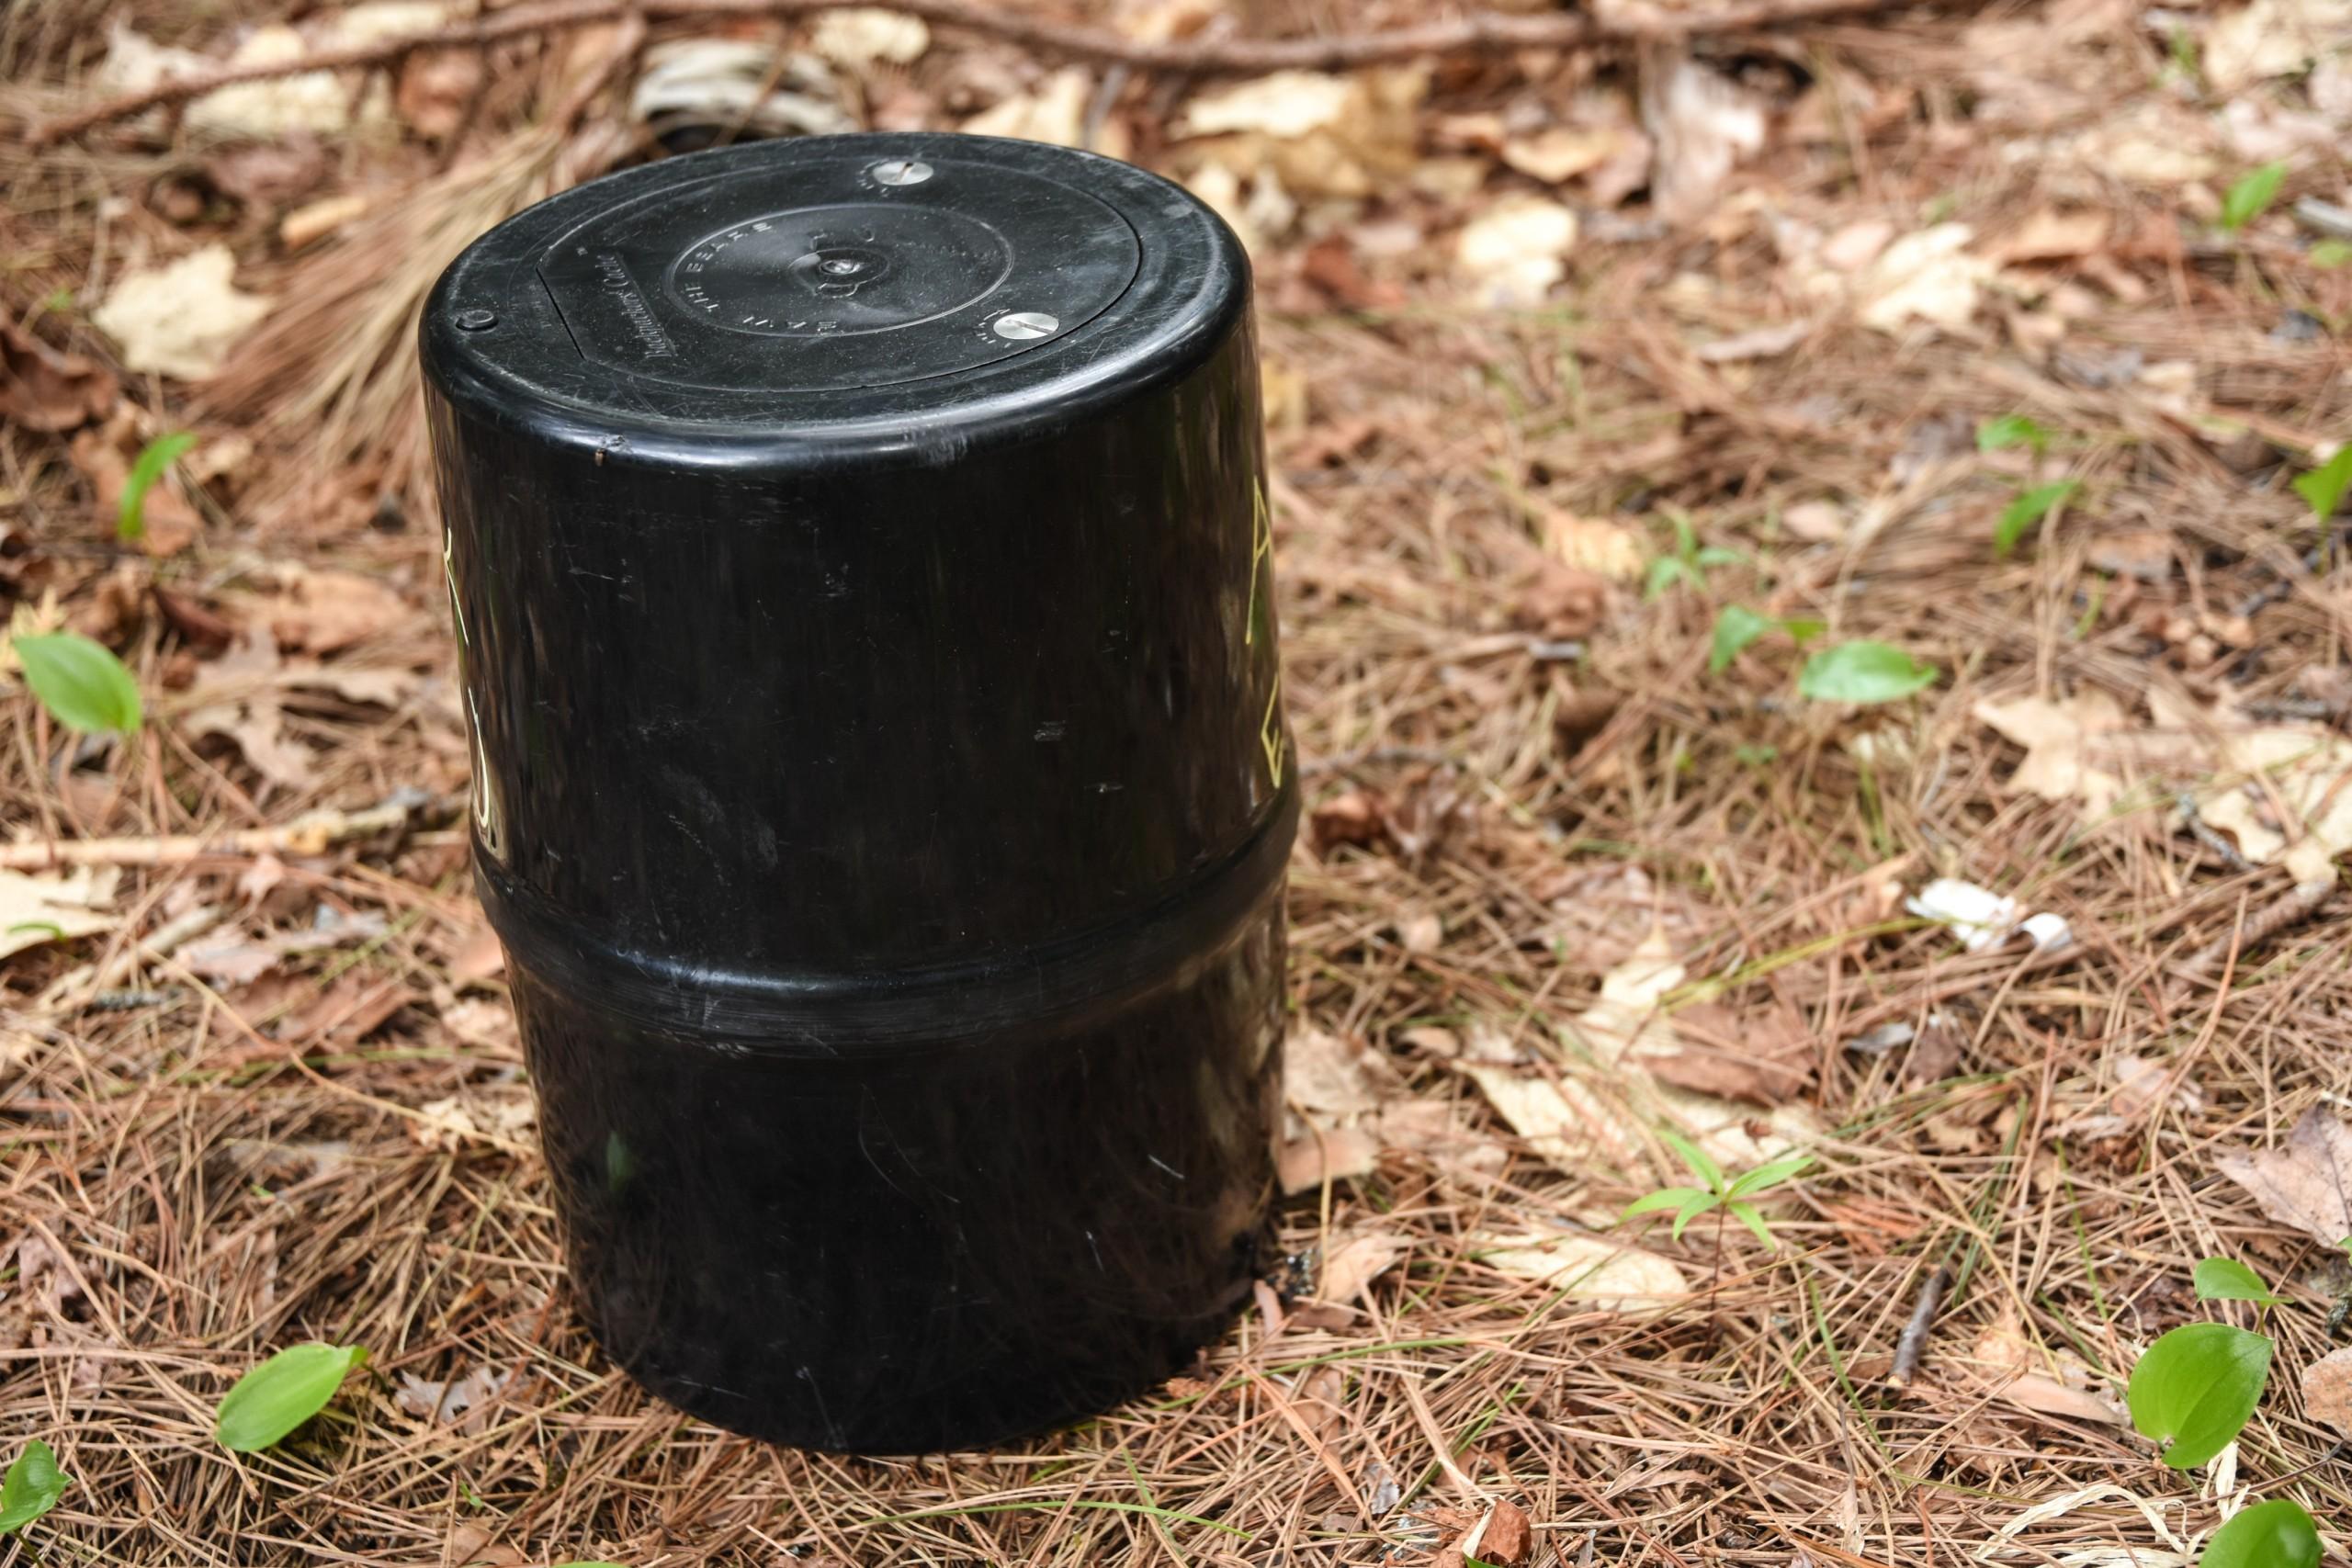 A black bear canister